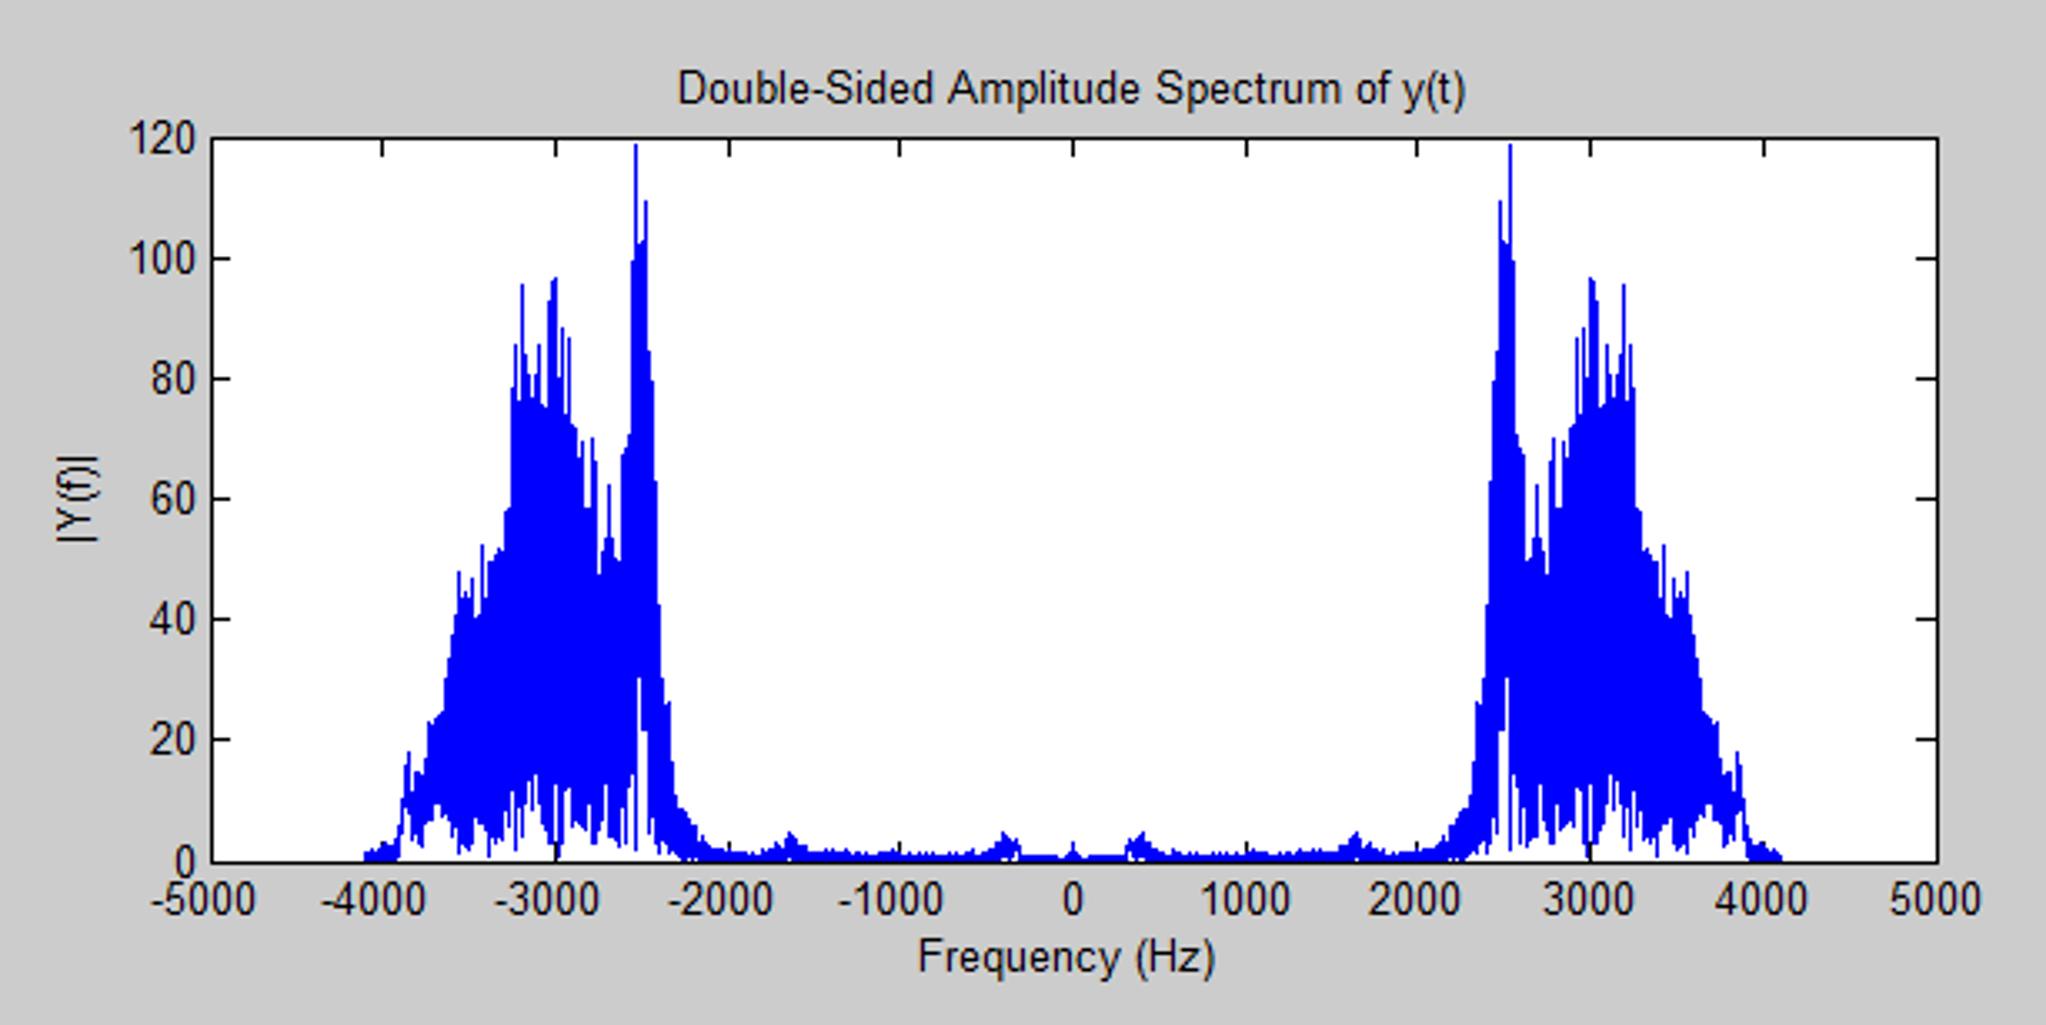 Solved: MATLAB Help  [y,Fs] = Audioread('chirp wav')